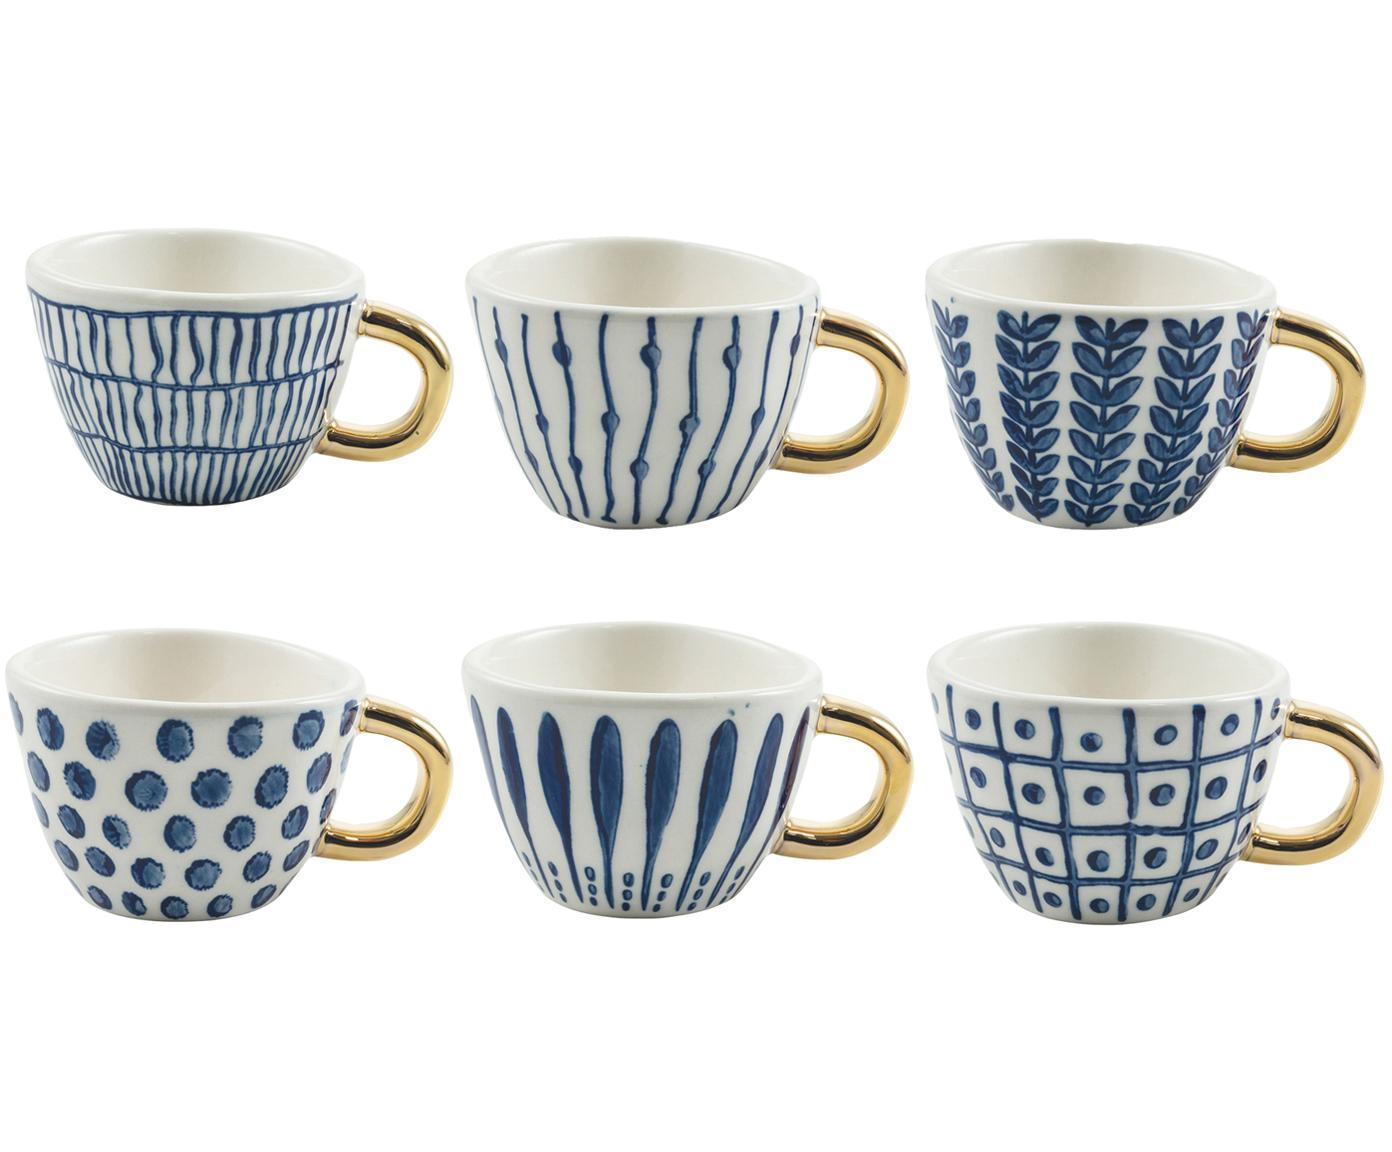 Tazas de café Masai, 6uds., Gres, Azul, blanco, dorado, Ø 7 x Al 5cm